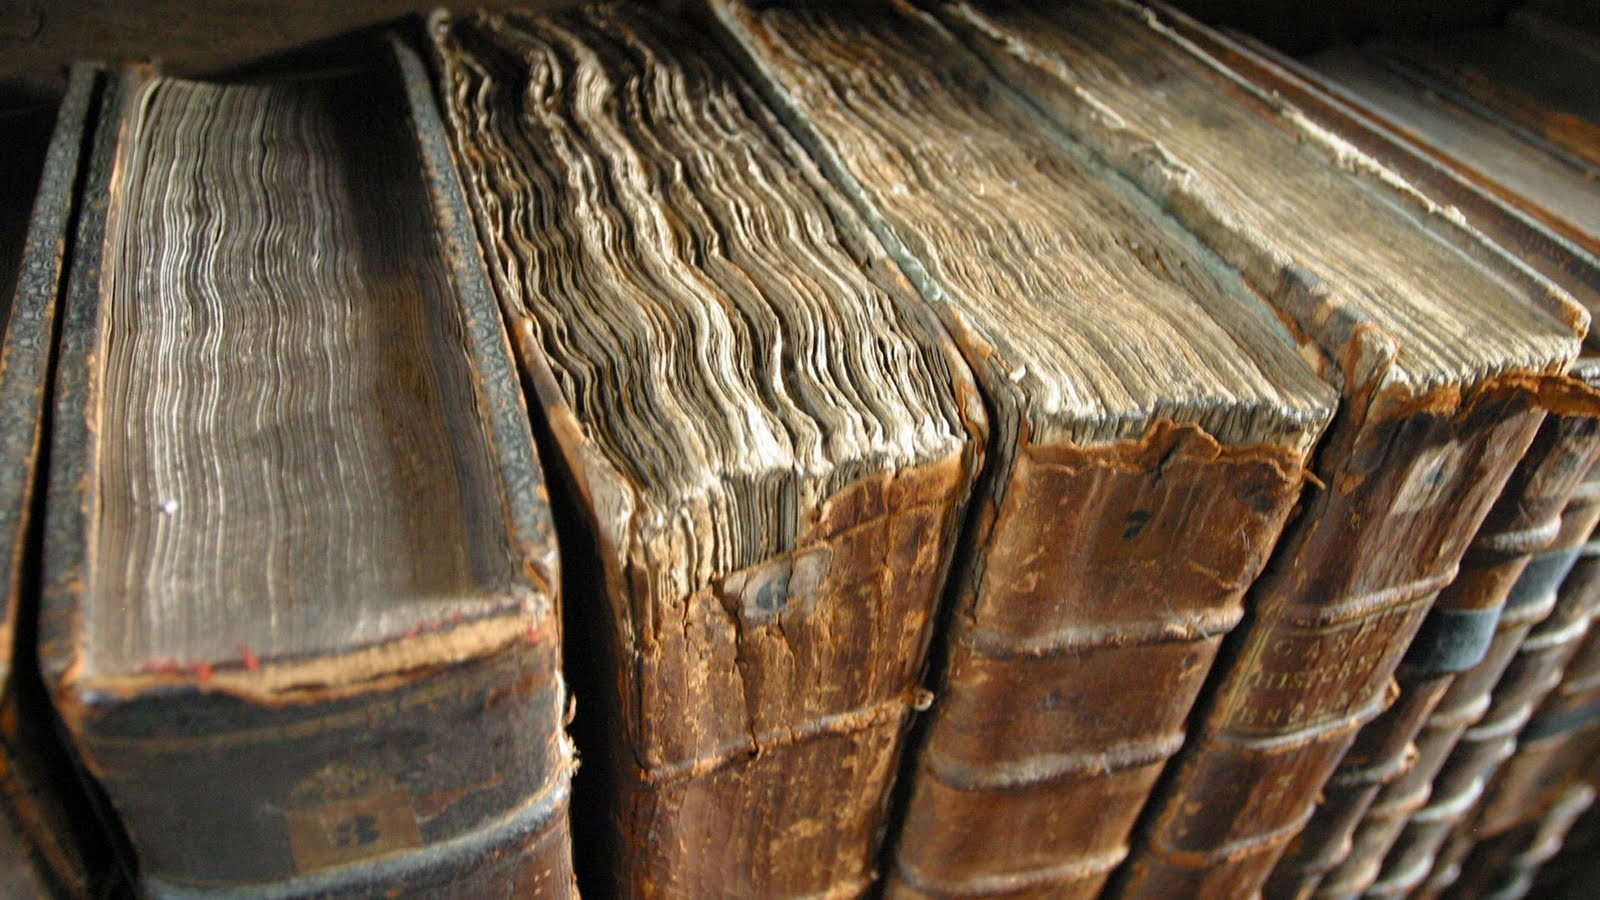 http://3.bp.blogspot.com/_cTXGuD89NEs/TETq1iEuBuI/AAAAAAAAAUE/wIksWnwejK8/s1600/Antique_booksWallpaper.jpg